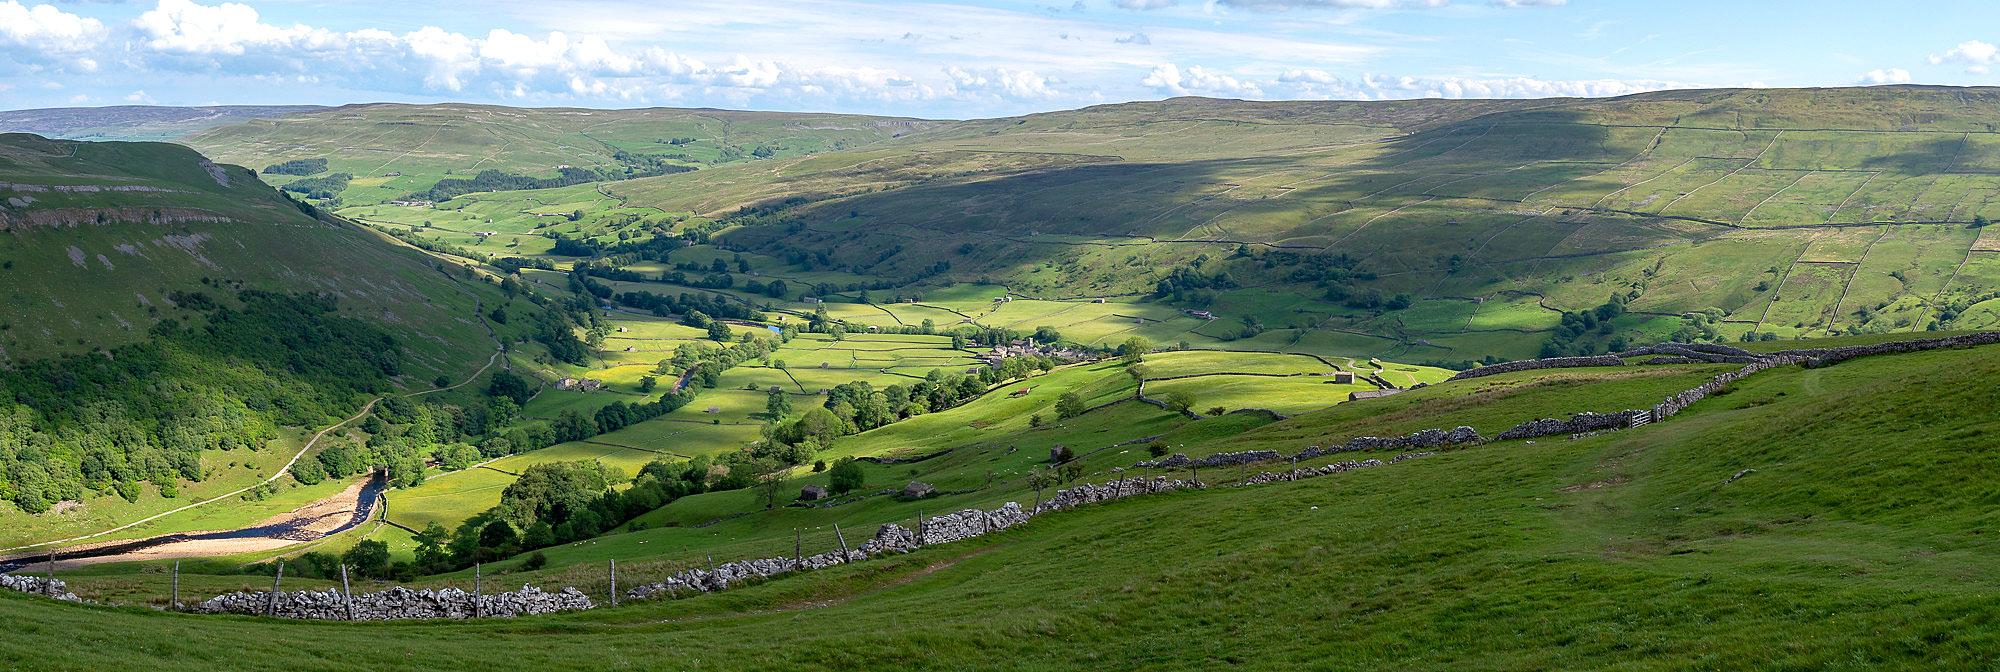 Swaledale panorama, Pennine Way above Muker by Bob Radlinski.jpg